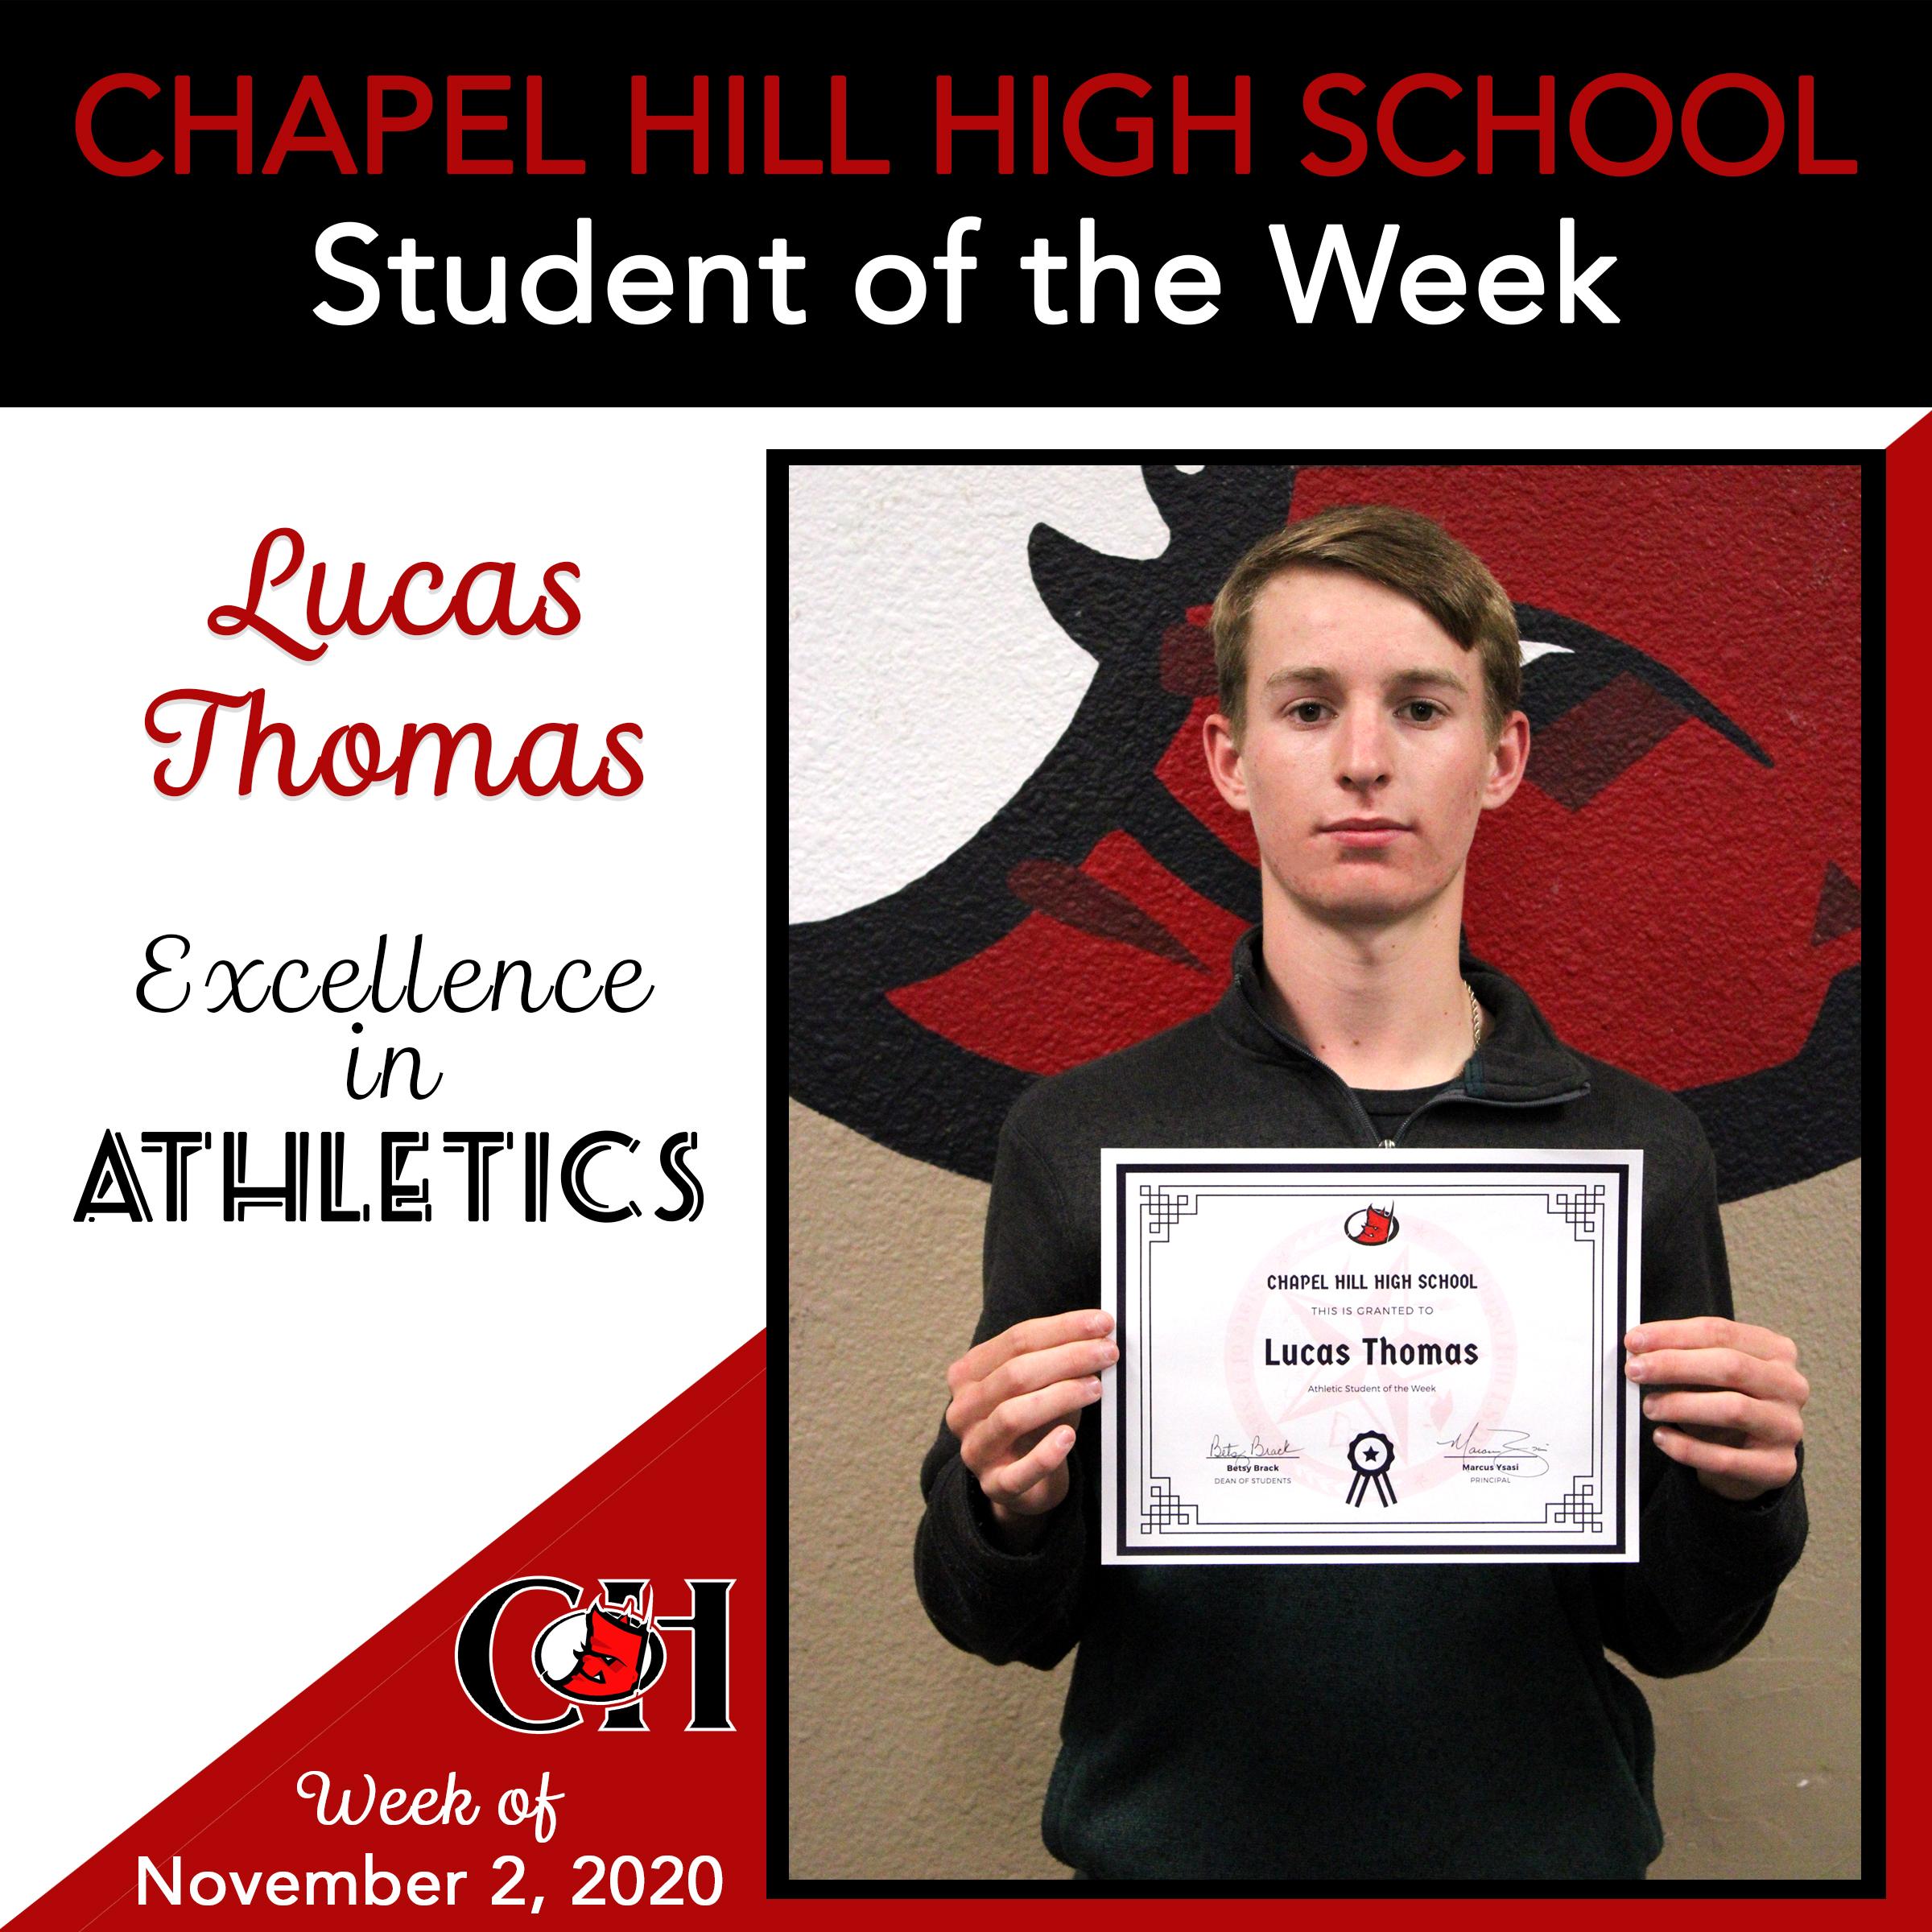 Lucas Thomas - Athletics